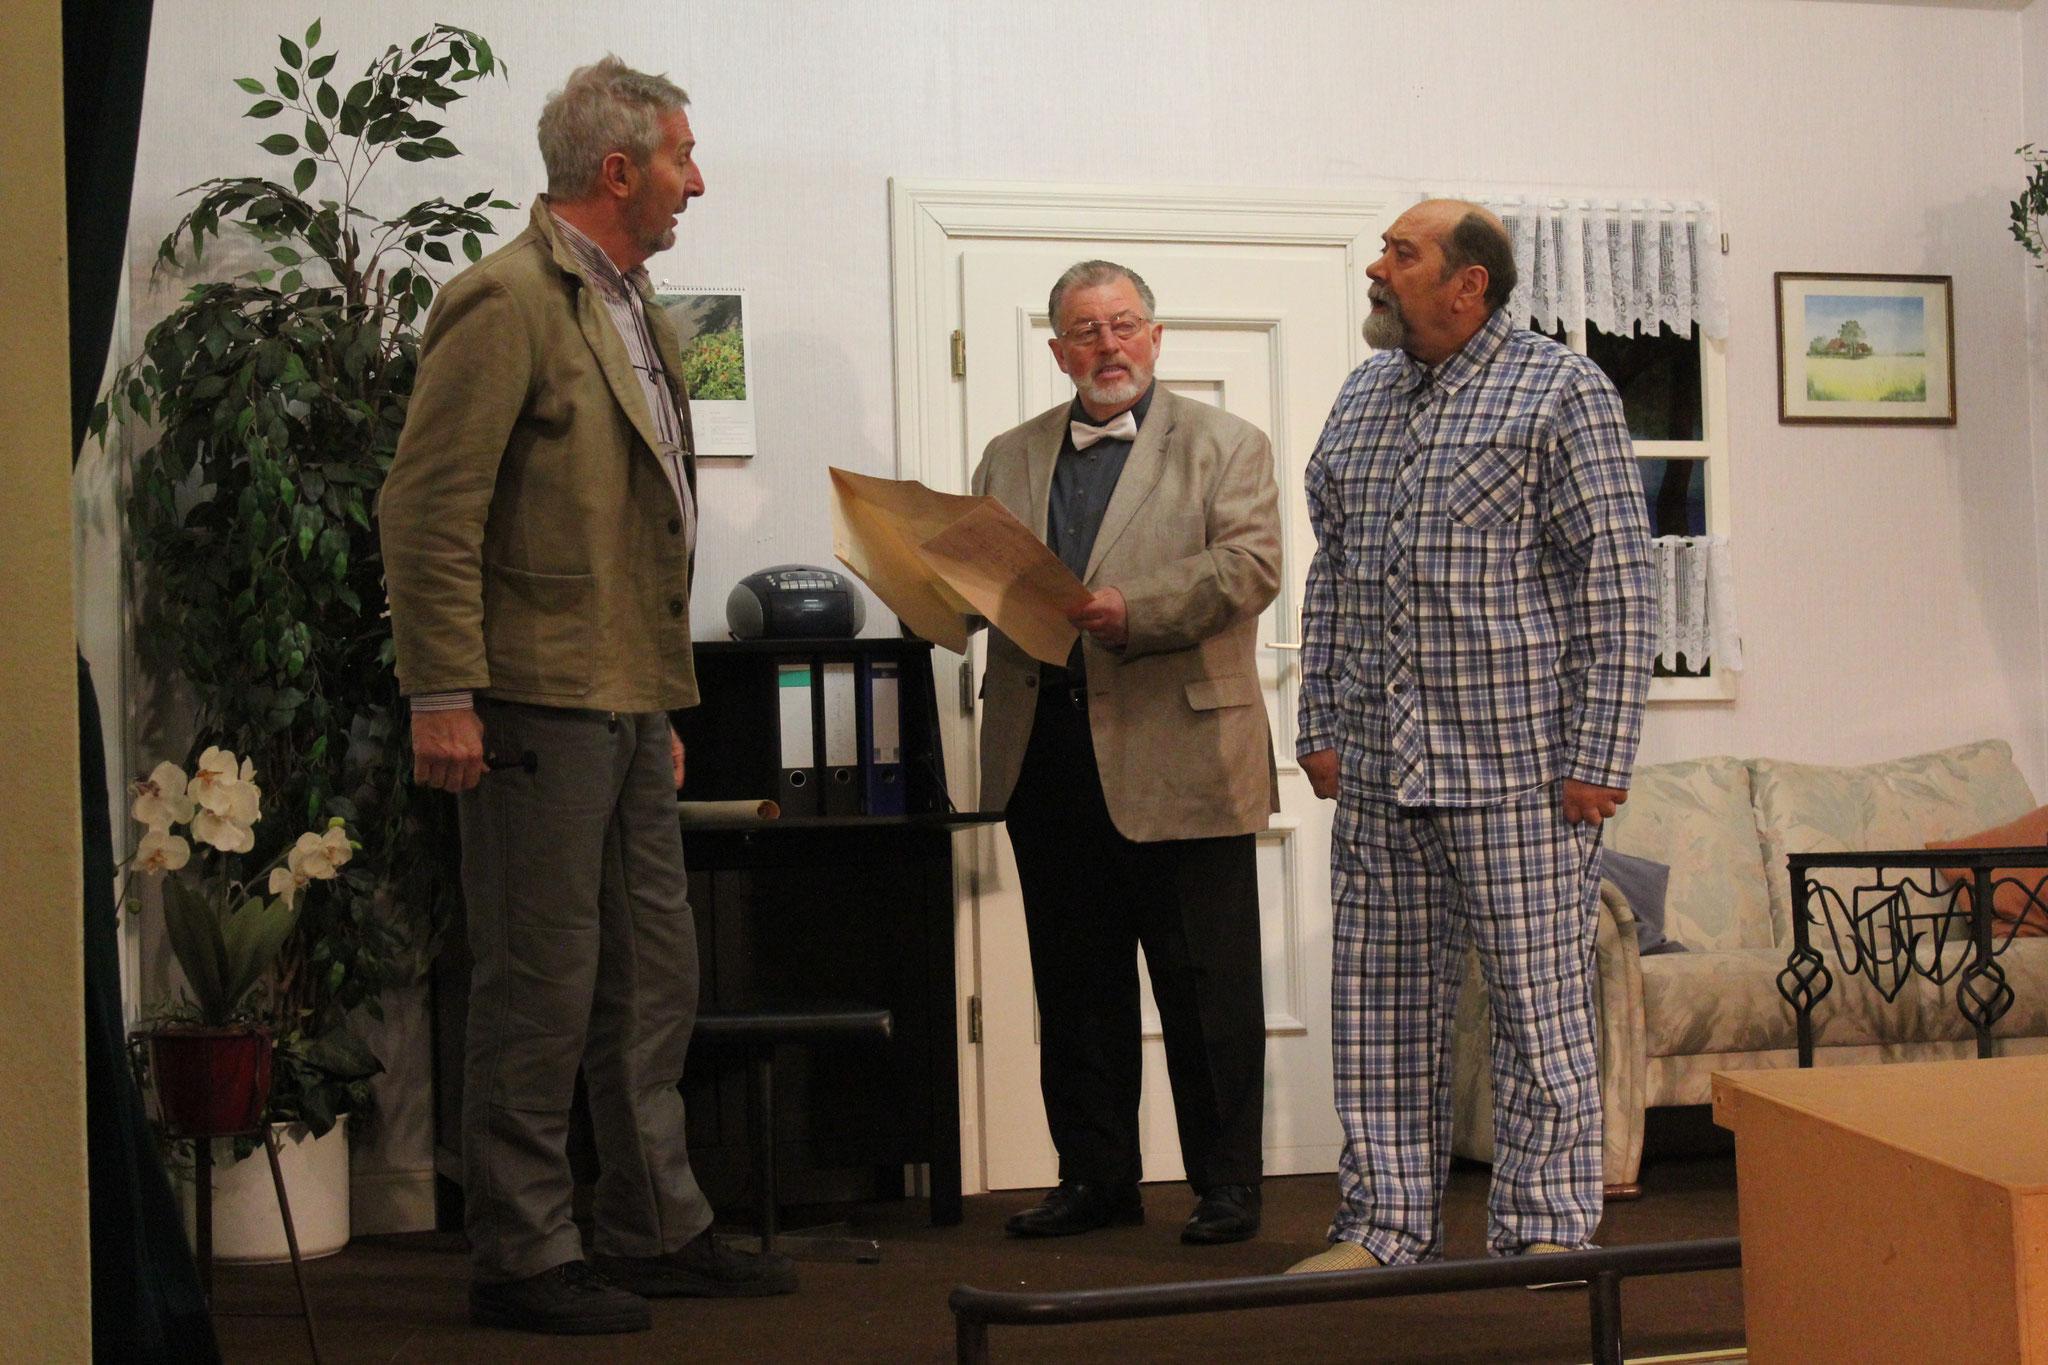 Wilke Visser, Hermann Schnoor, Jochen Besler